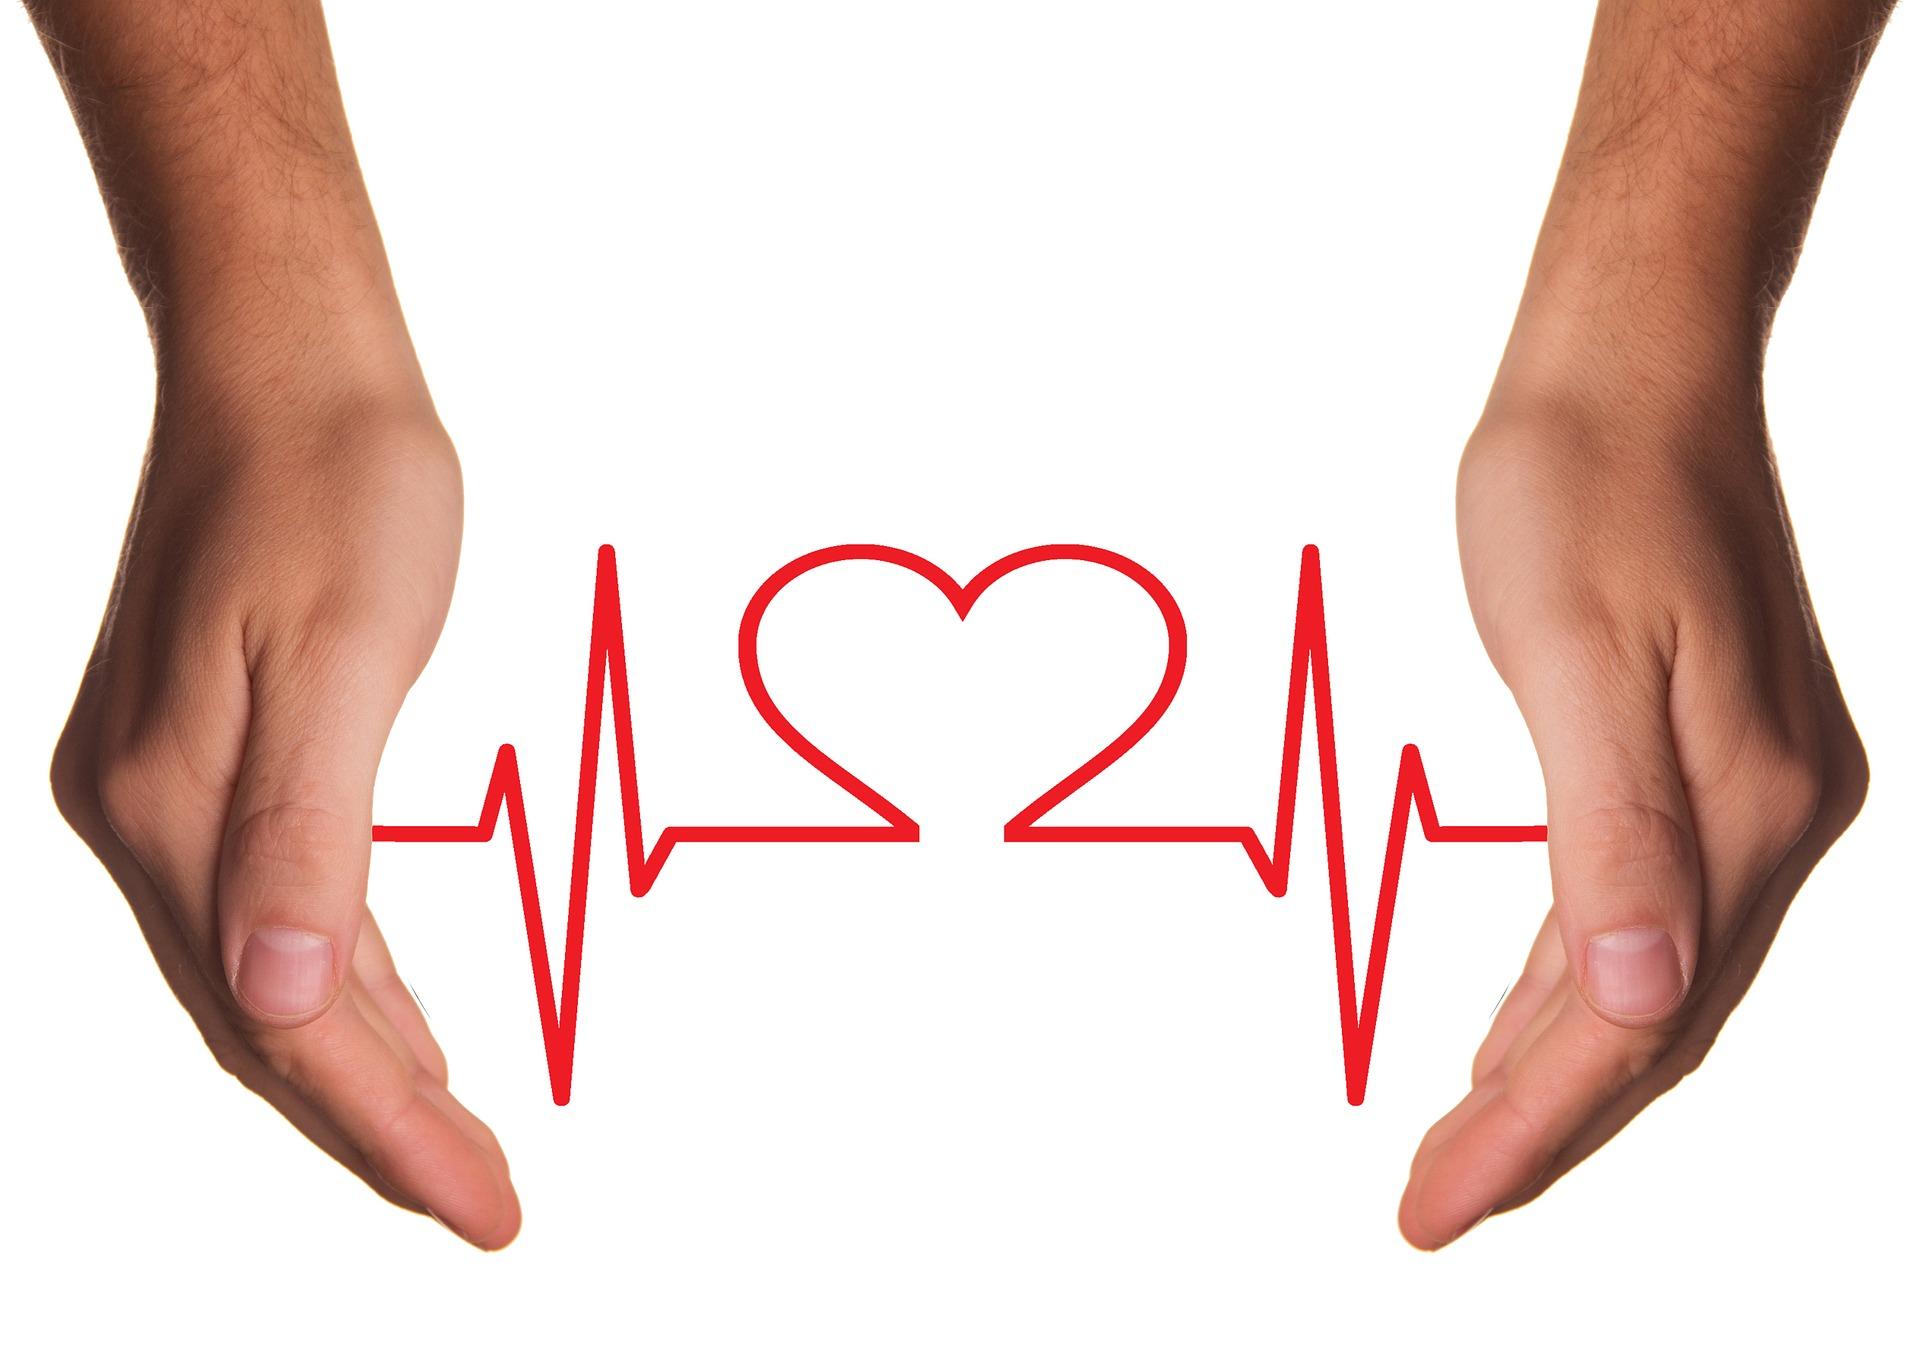 Heart Attack, Heart Failure and Cardiac Arrest